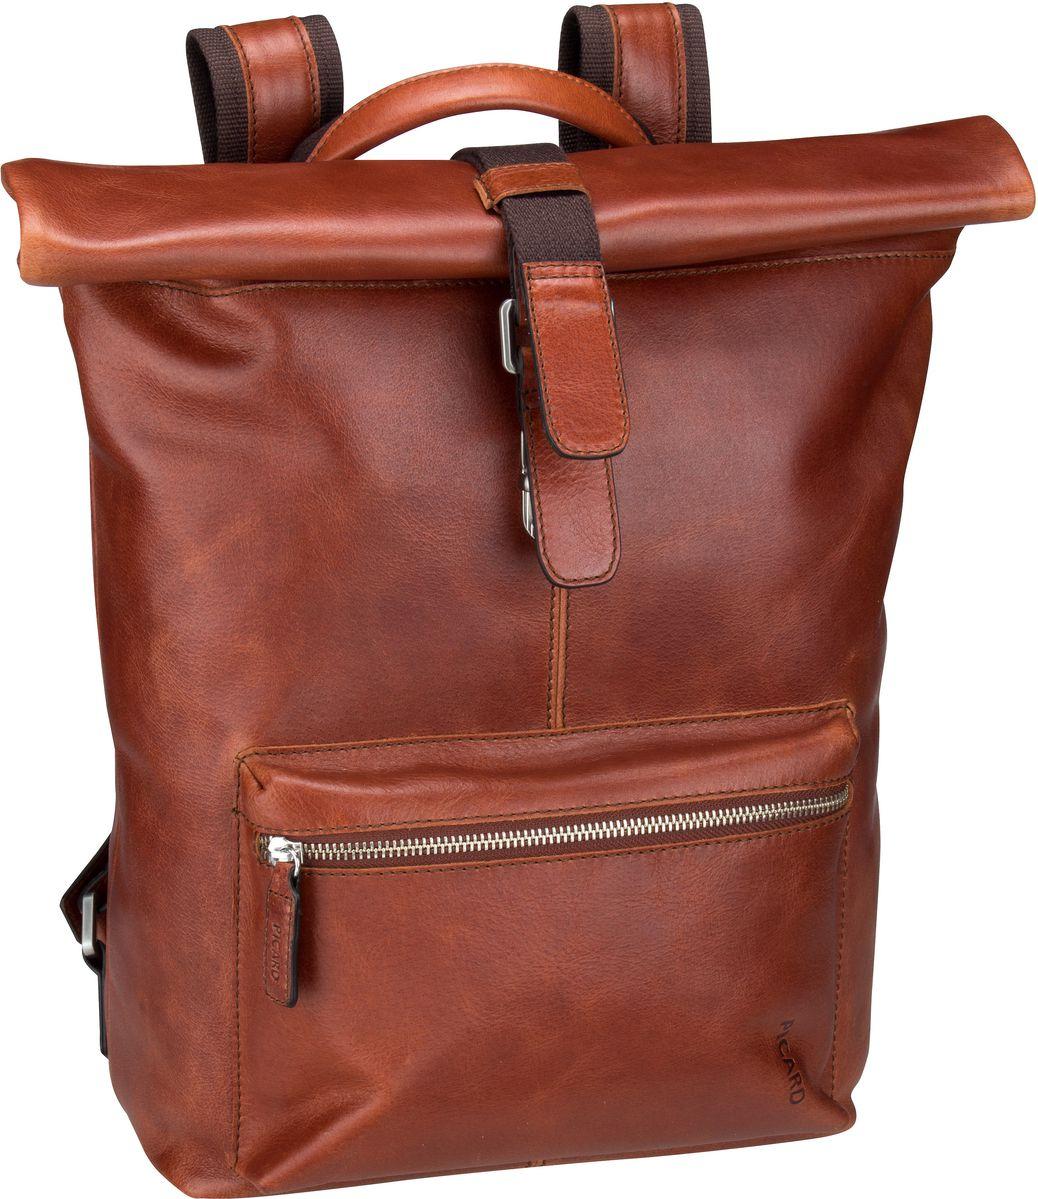 Rucksack / Daypack Buddy 4758 Cognac